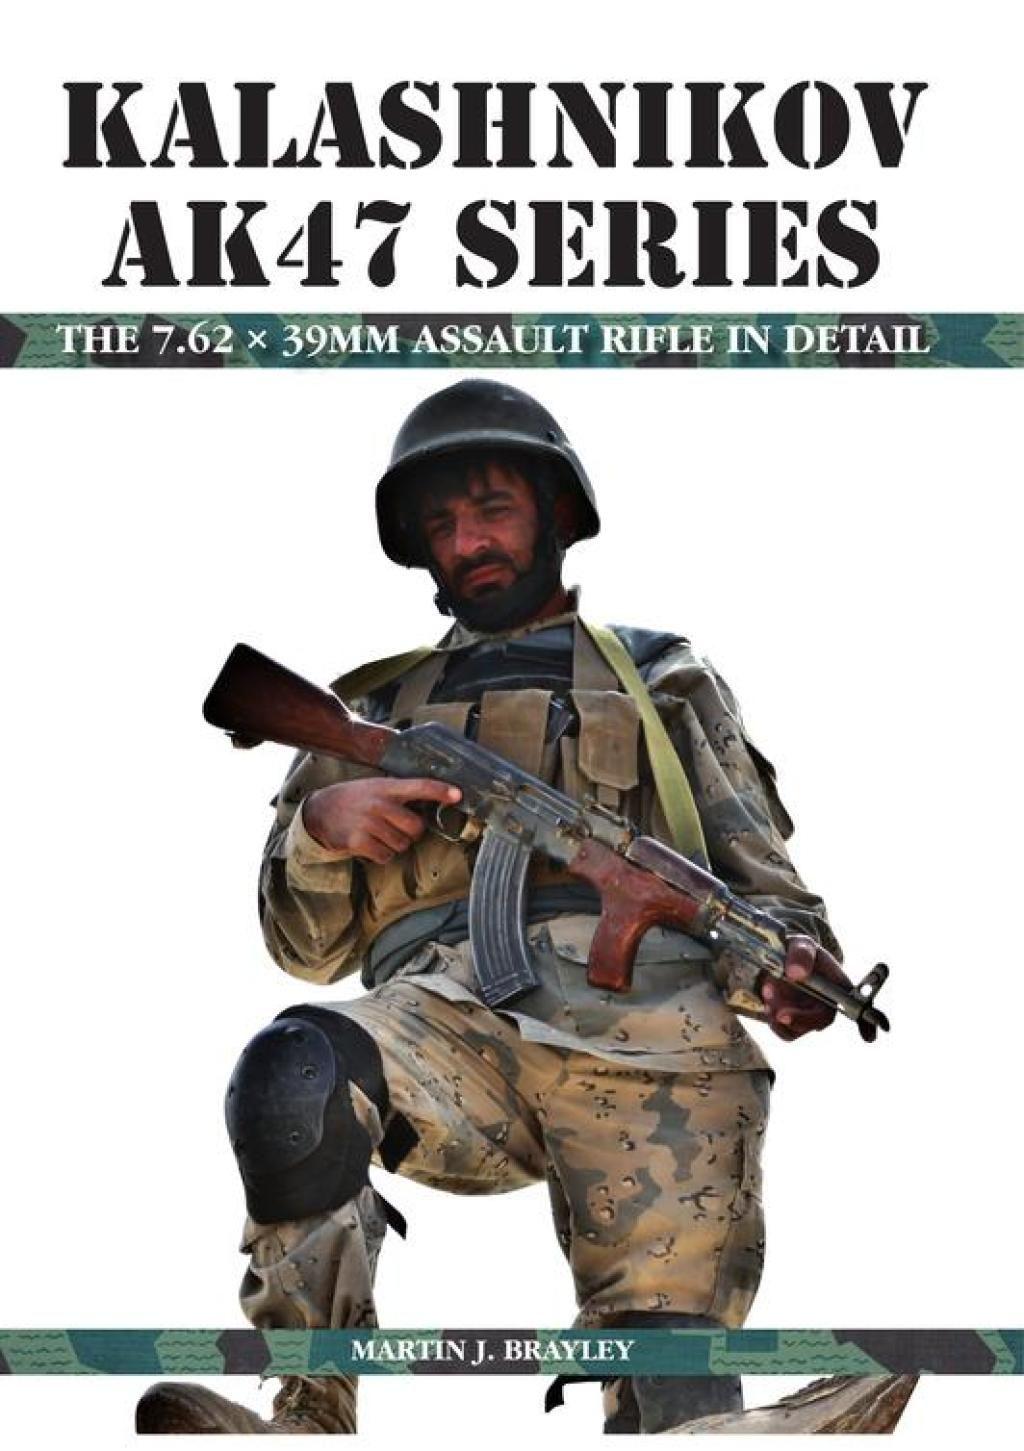 Kalashnikov AK47 Series (eBook) | Products in 2019 | Books